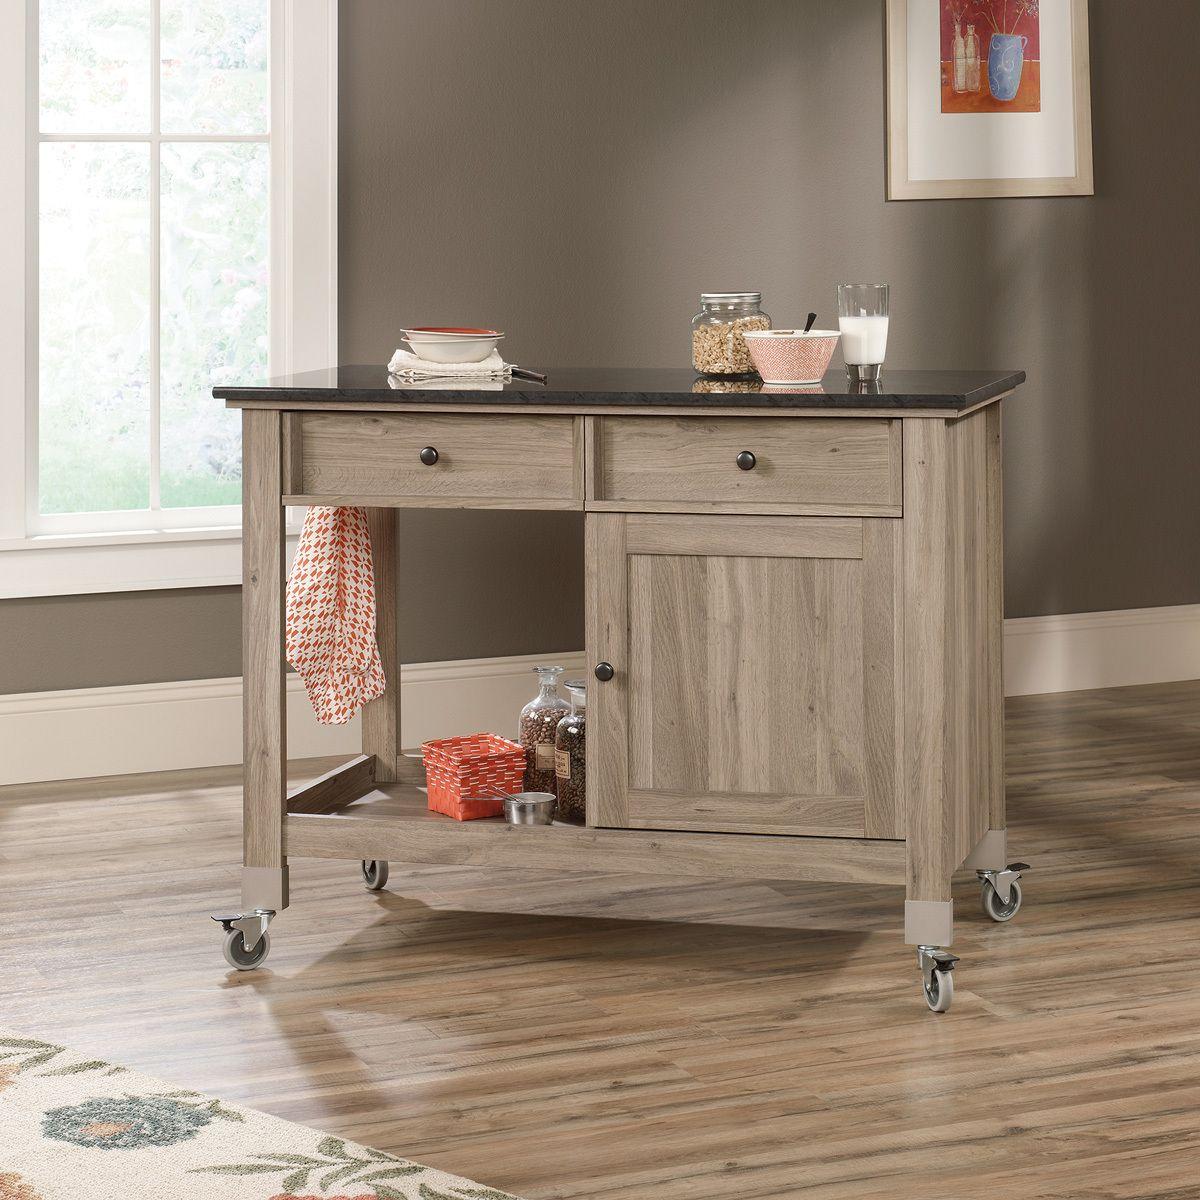 J.Conrad Furniture - Sauder Mobile Kitchen Island (417089), $369.99 (http://www.jconradfurniture.com/Sauder-Mobile-Kitchen-Island-417089/)